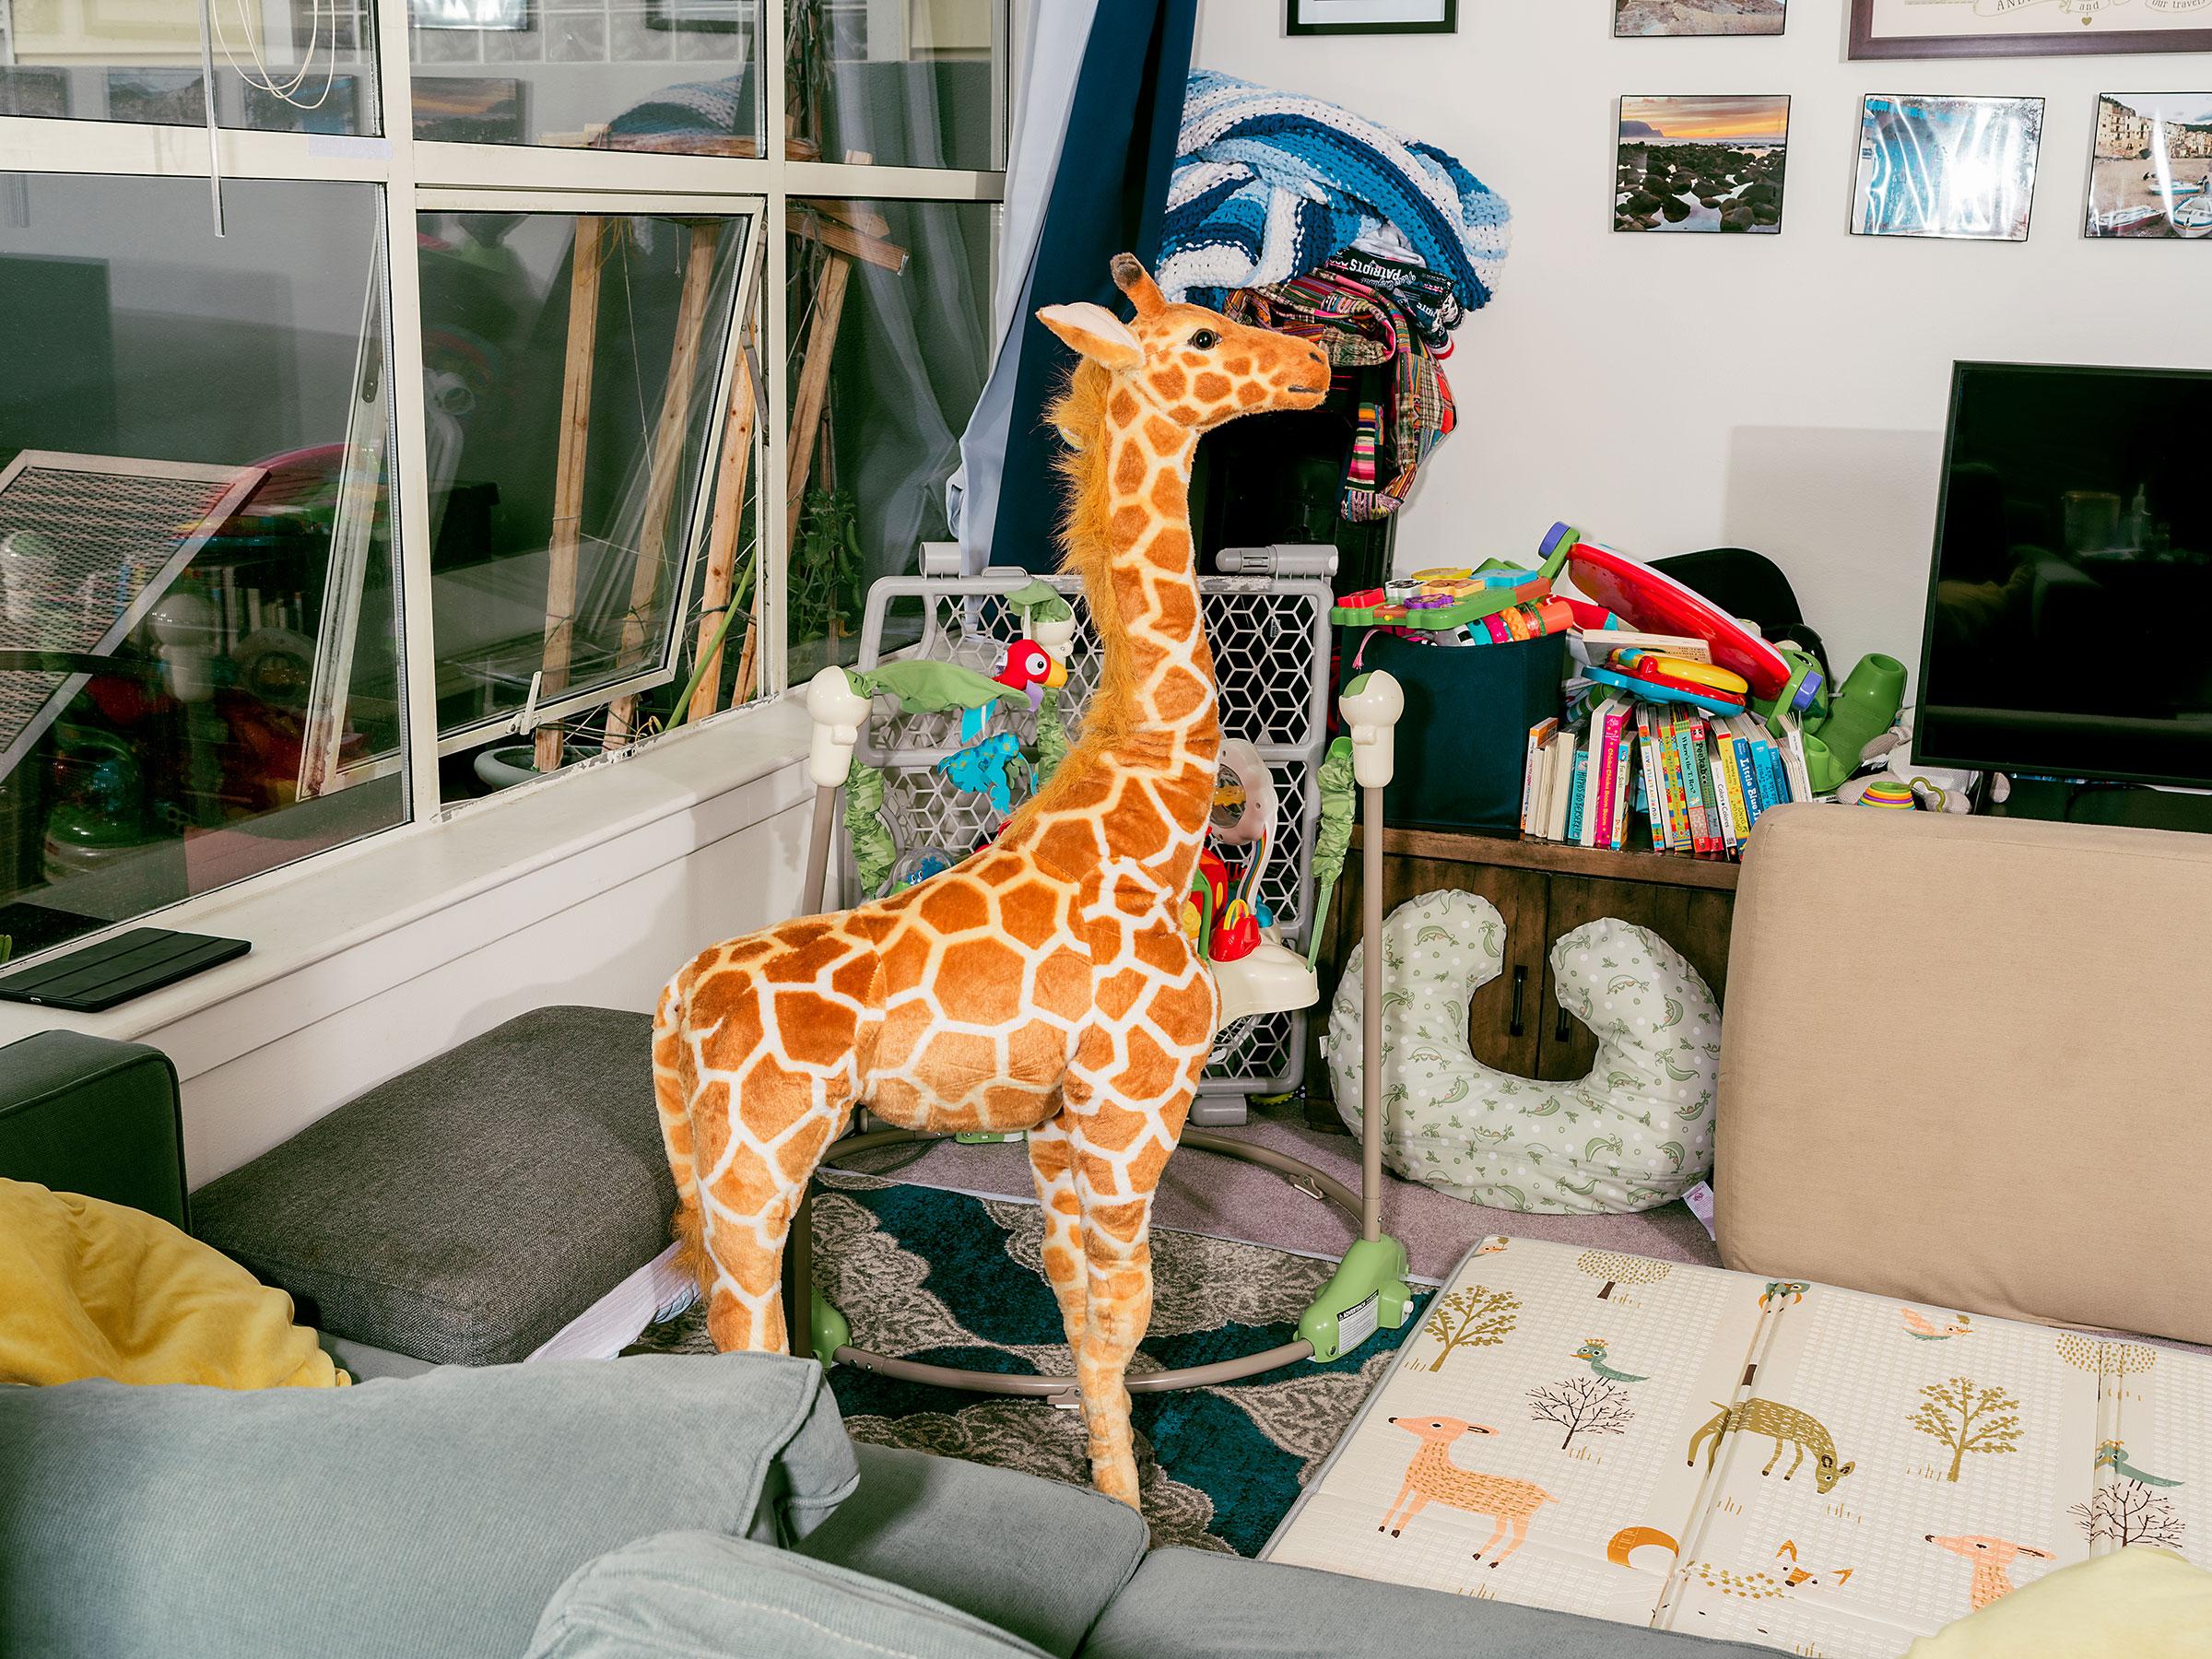 Jani the giraffe at home in San Francisco.